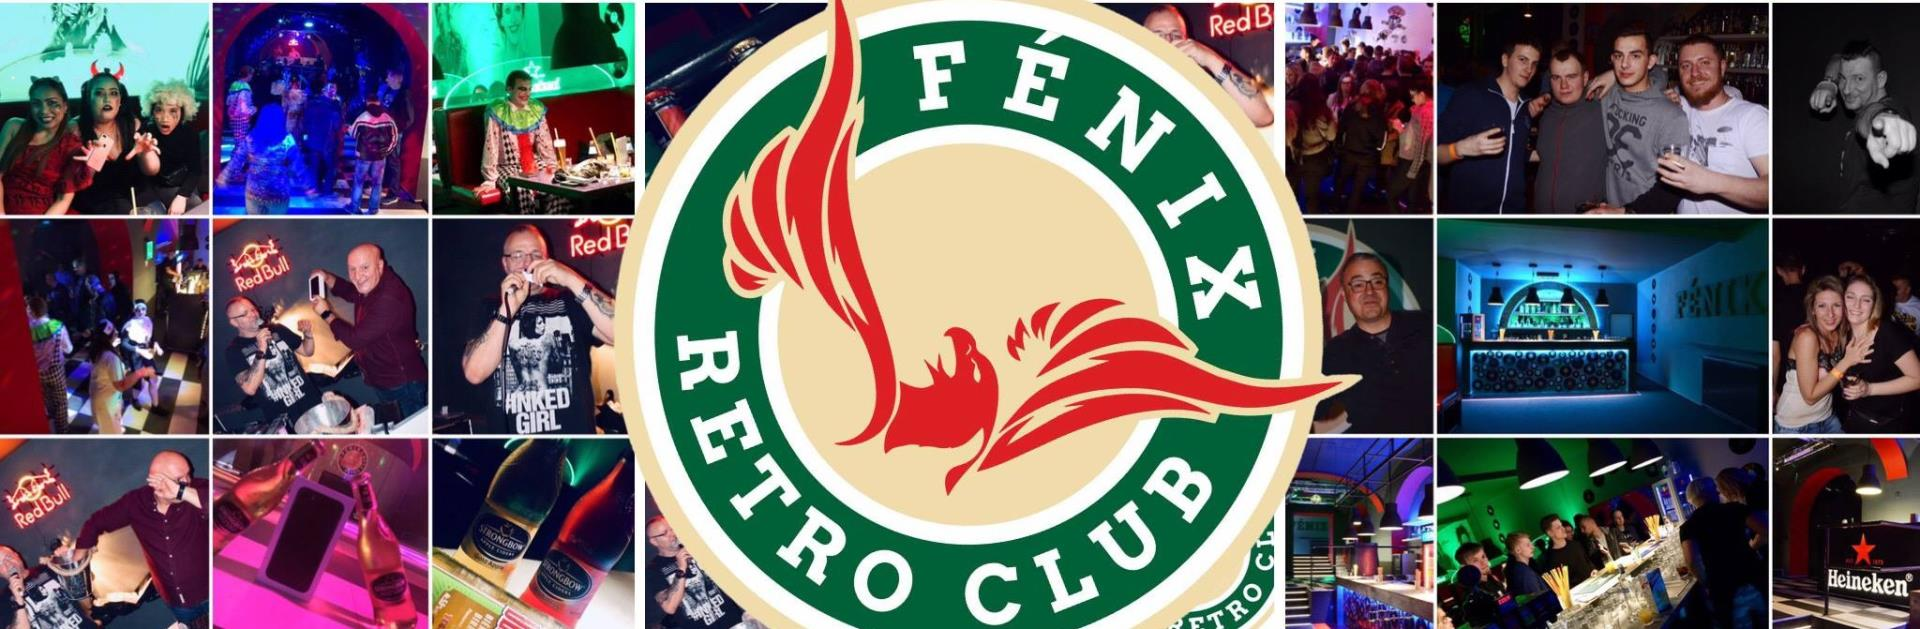 Fénix retro club